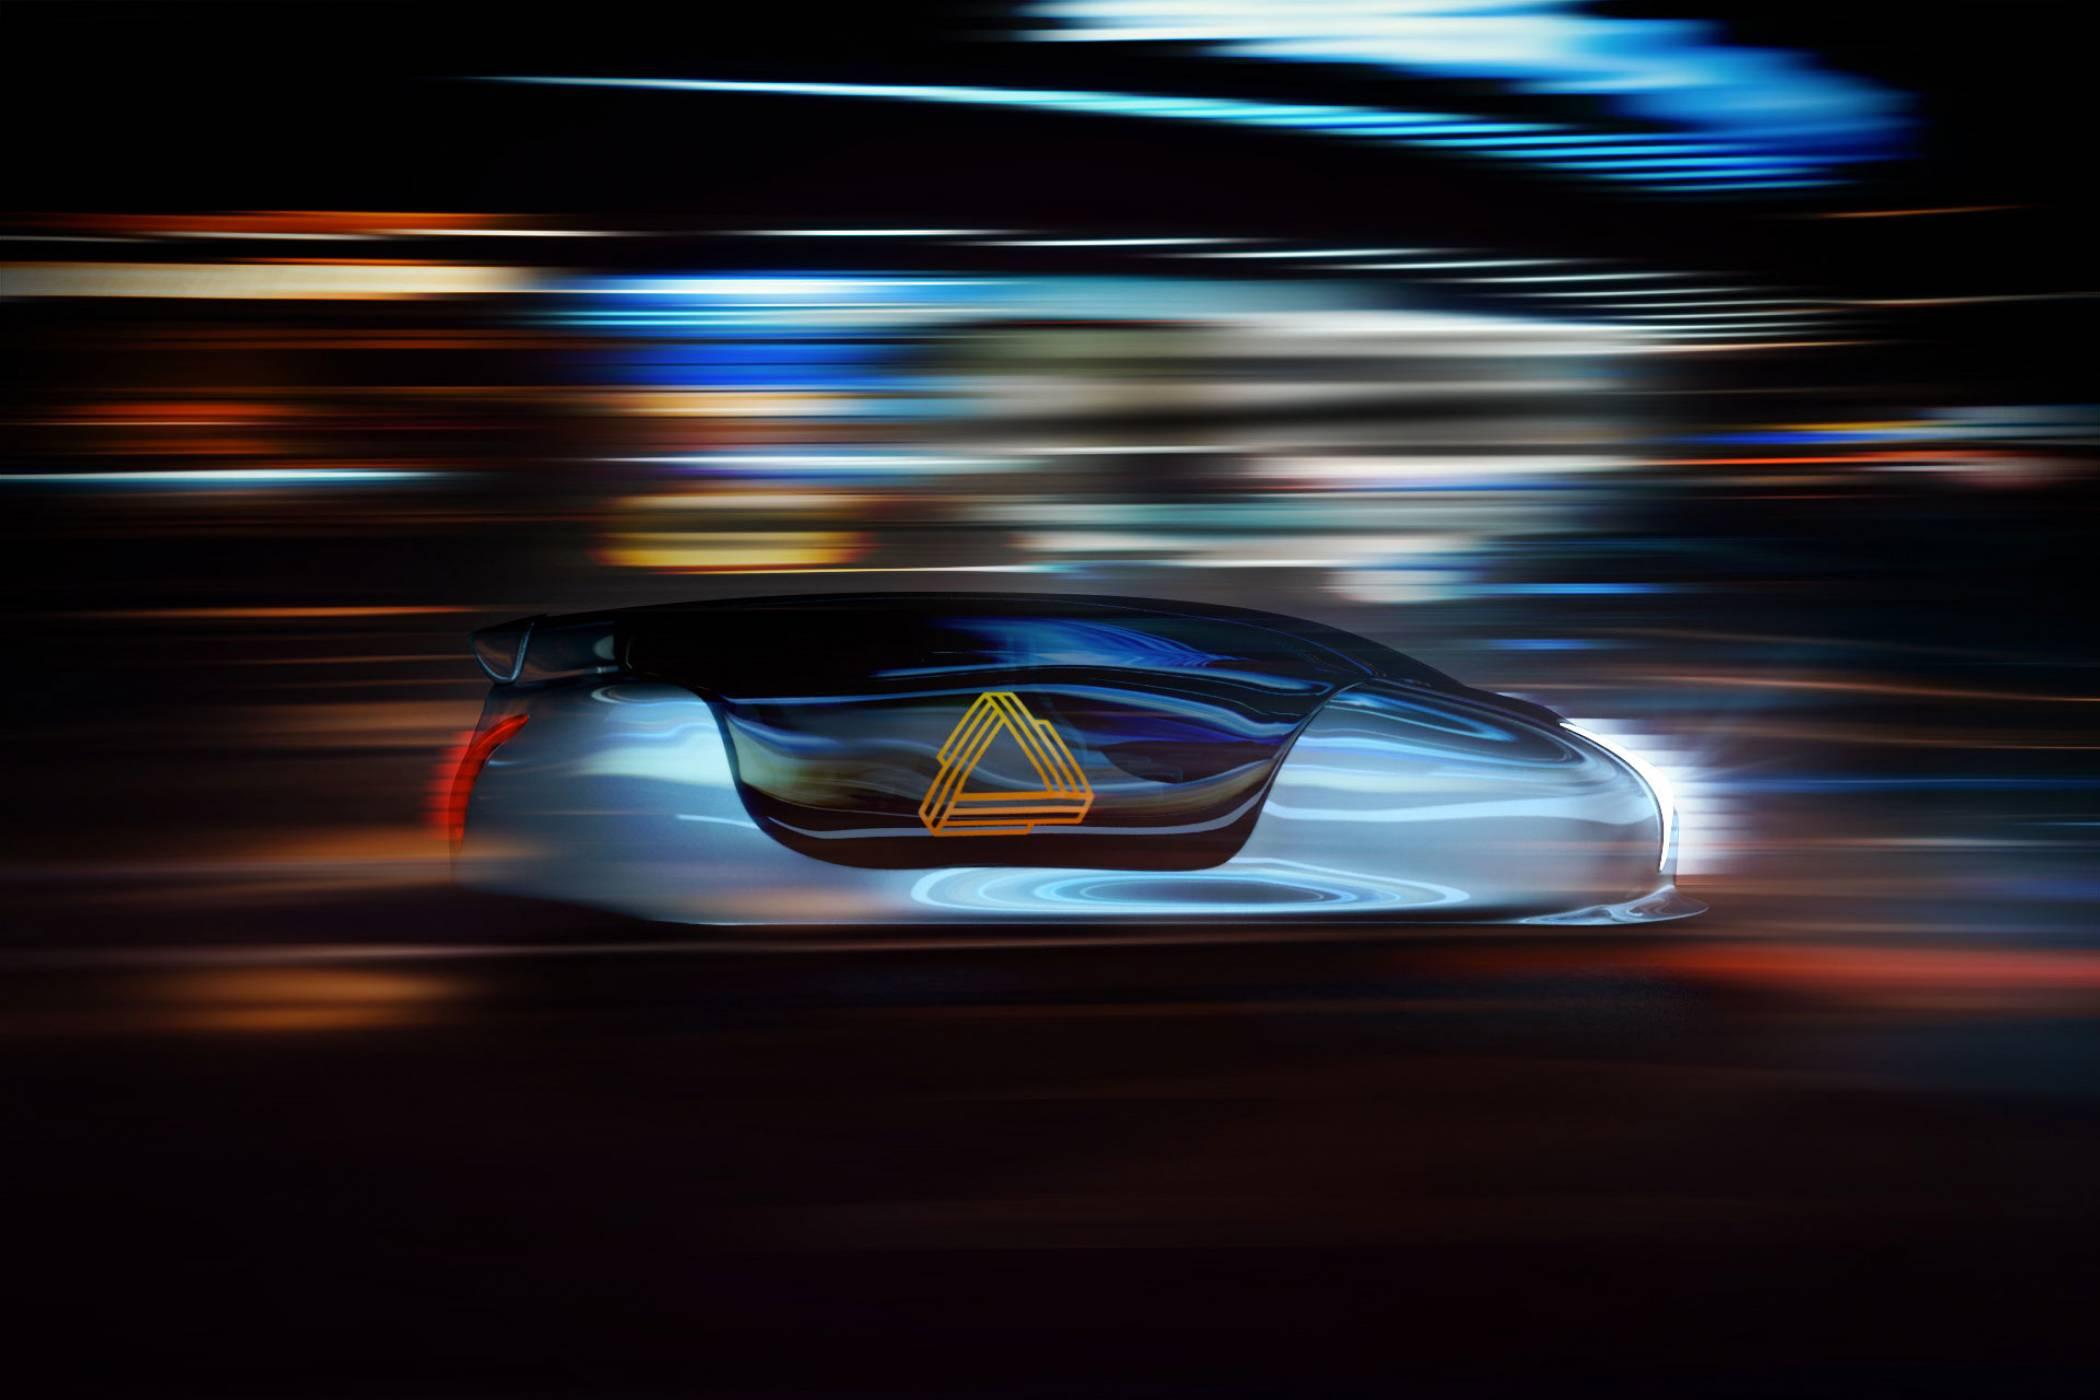 Китай дава 1 млрд. долара за Hyperloop трасе за коли